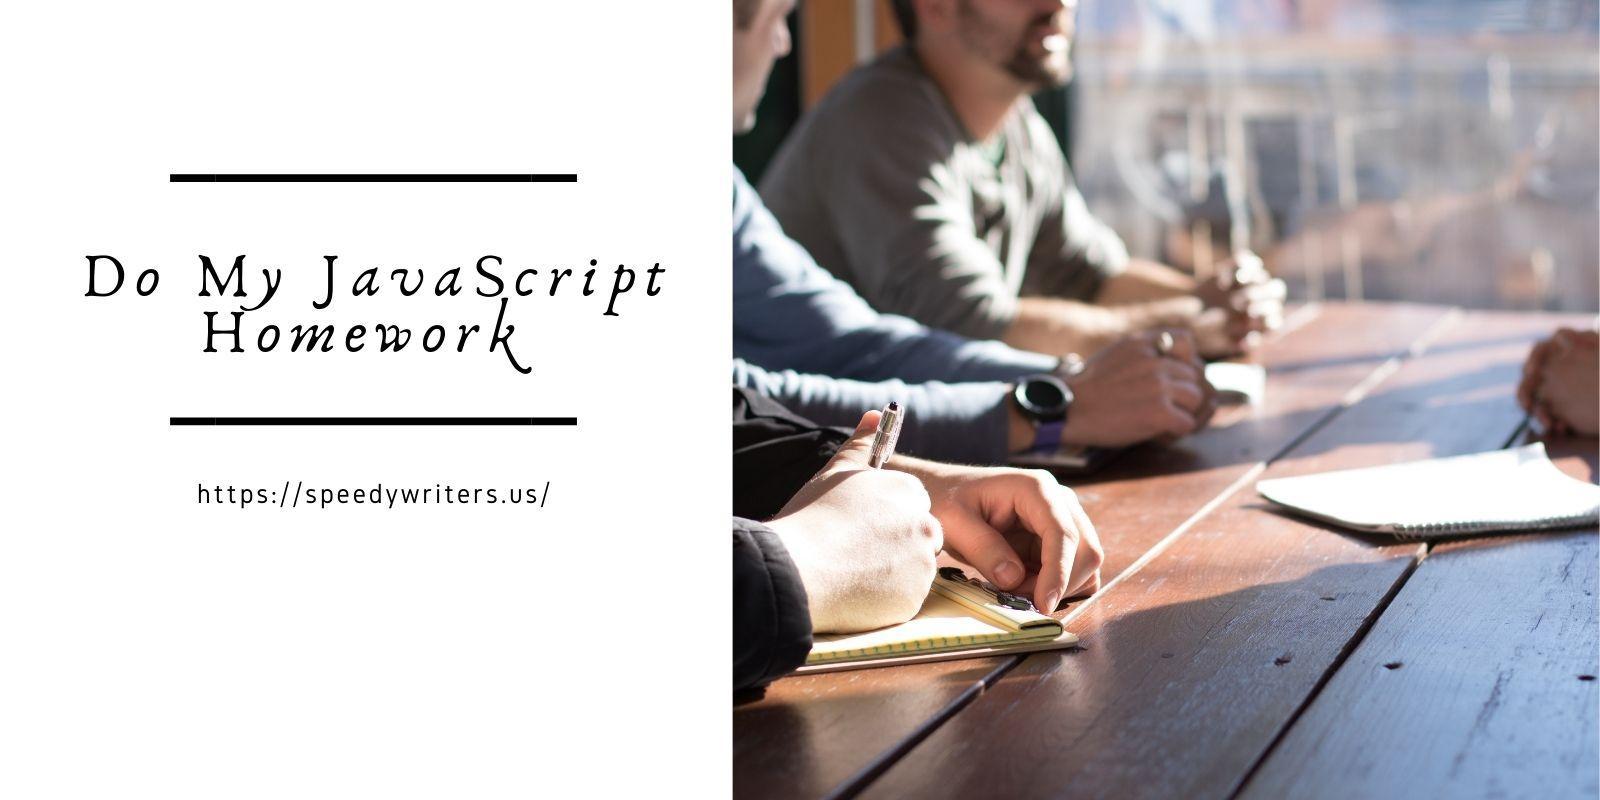 Do My JavaScript Homework